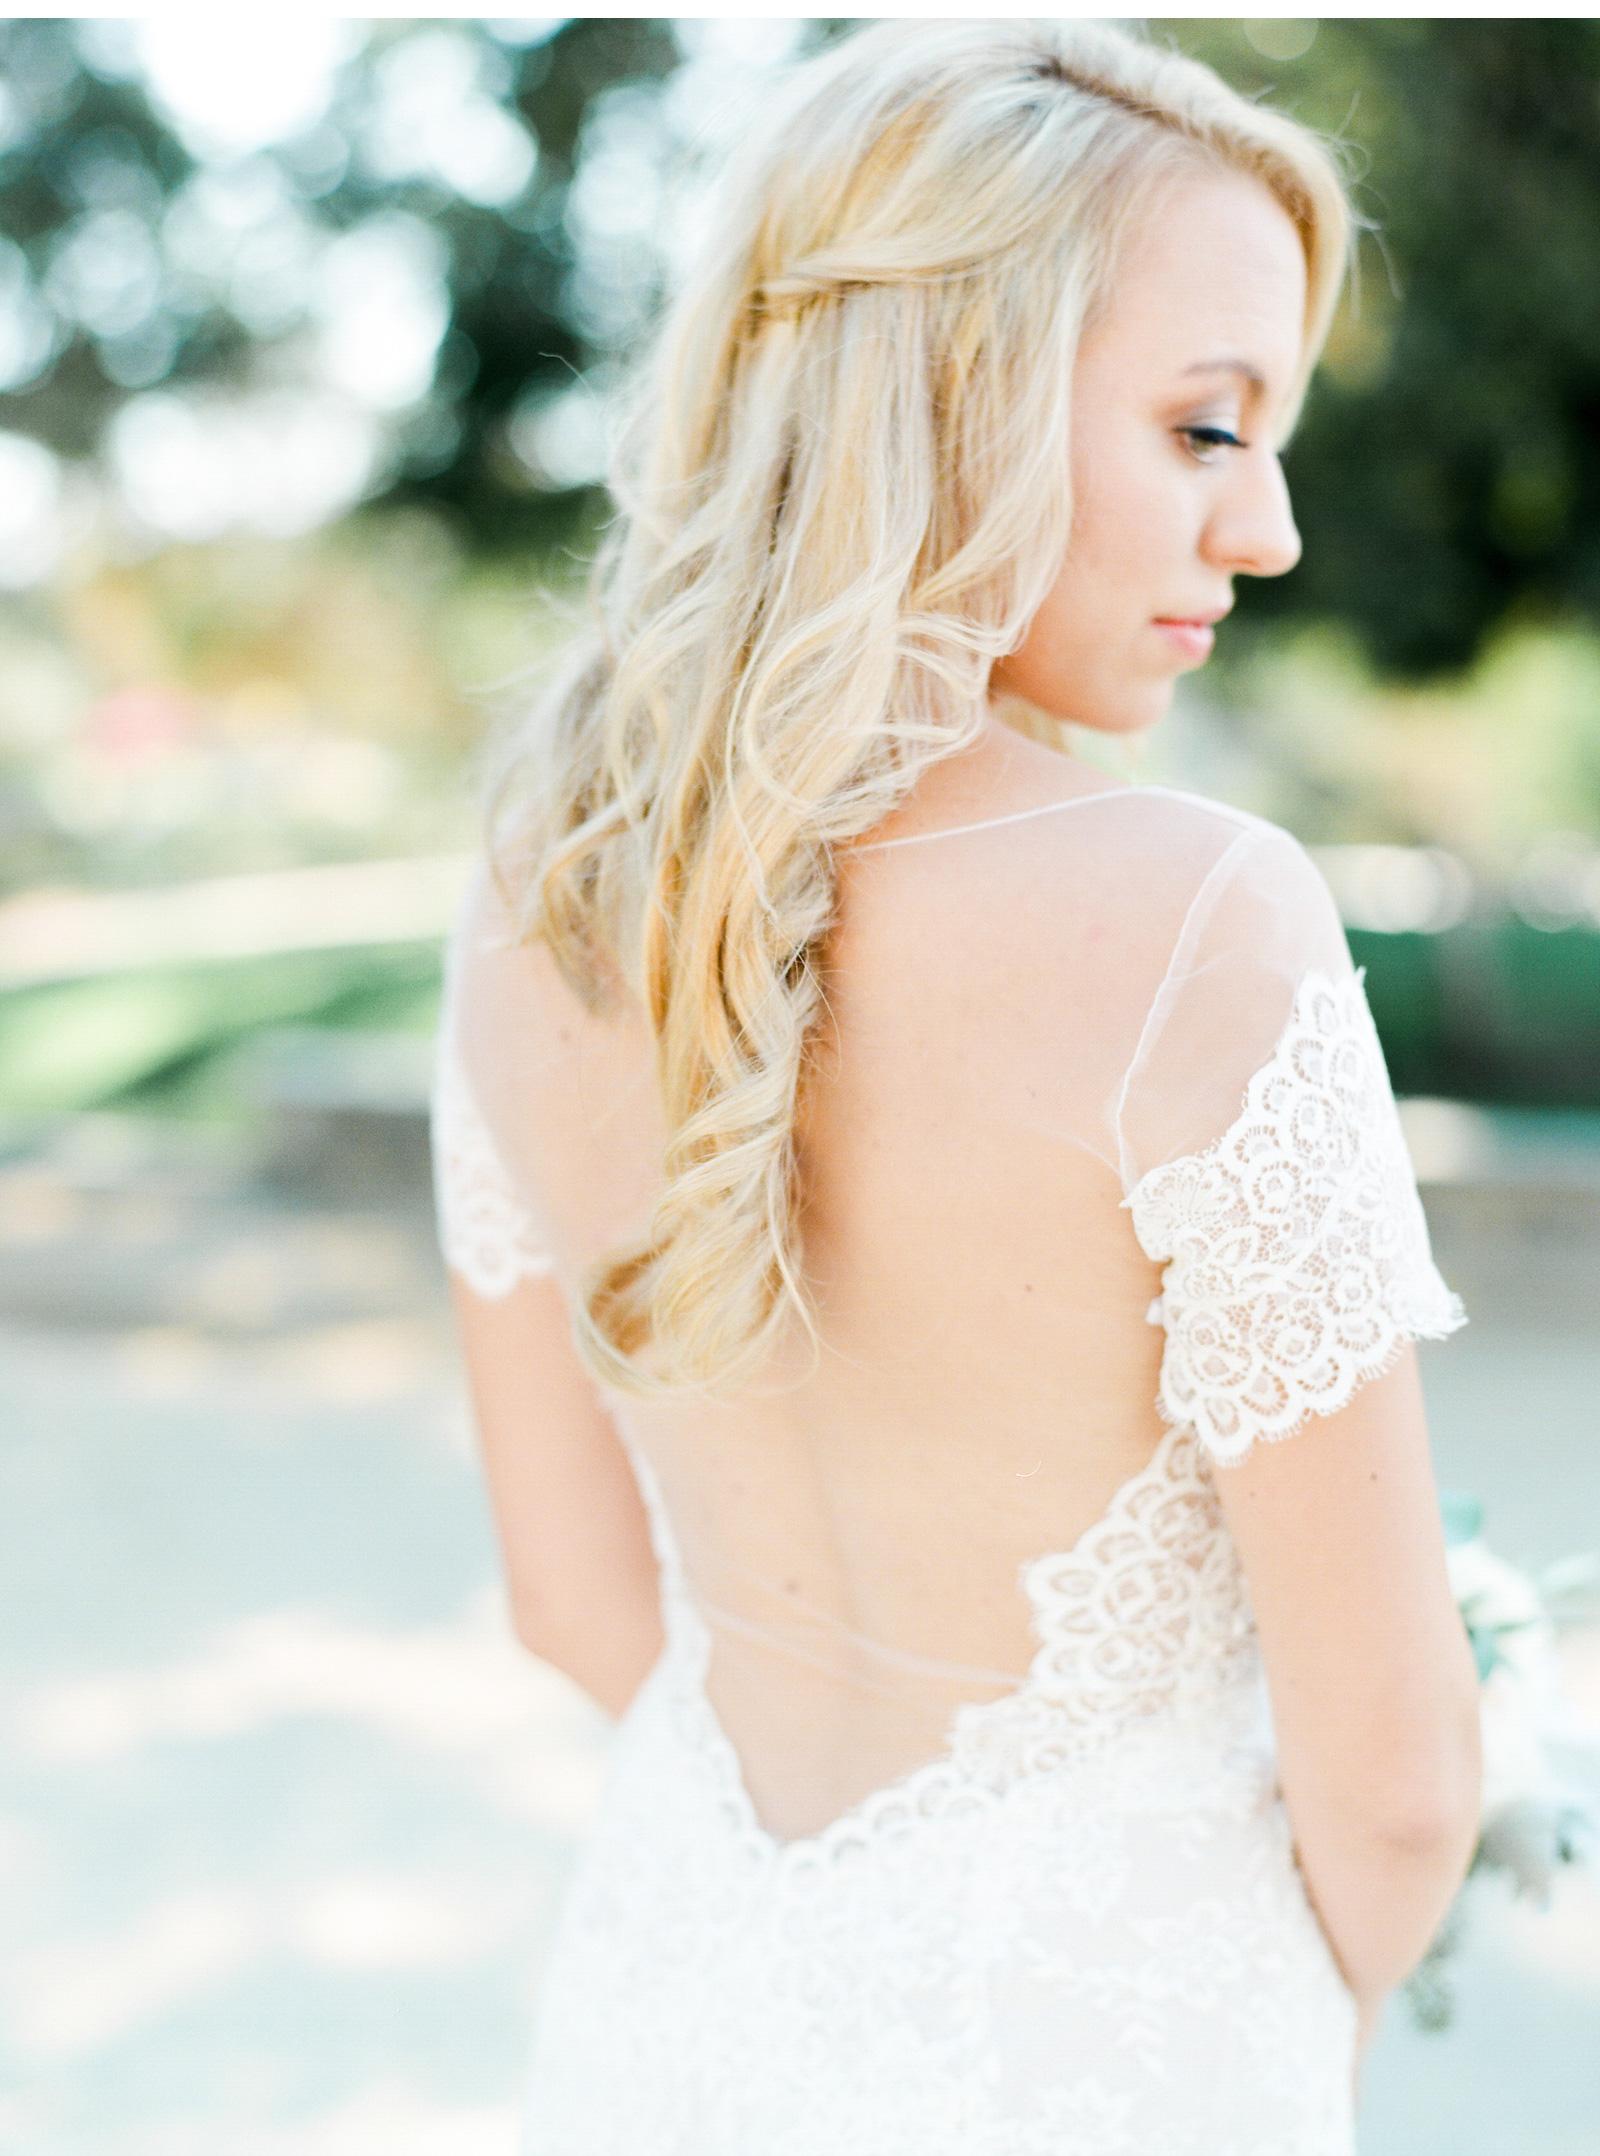 Triunfo-Orange-County-Temecula-Wedding-Photographer-Style-Me-Pretty-Natalie-Schutt-Photography_05.jpg